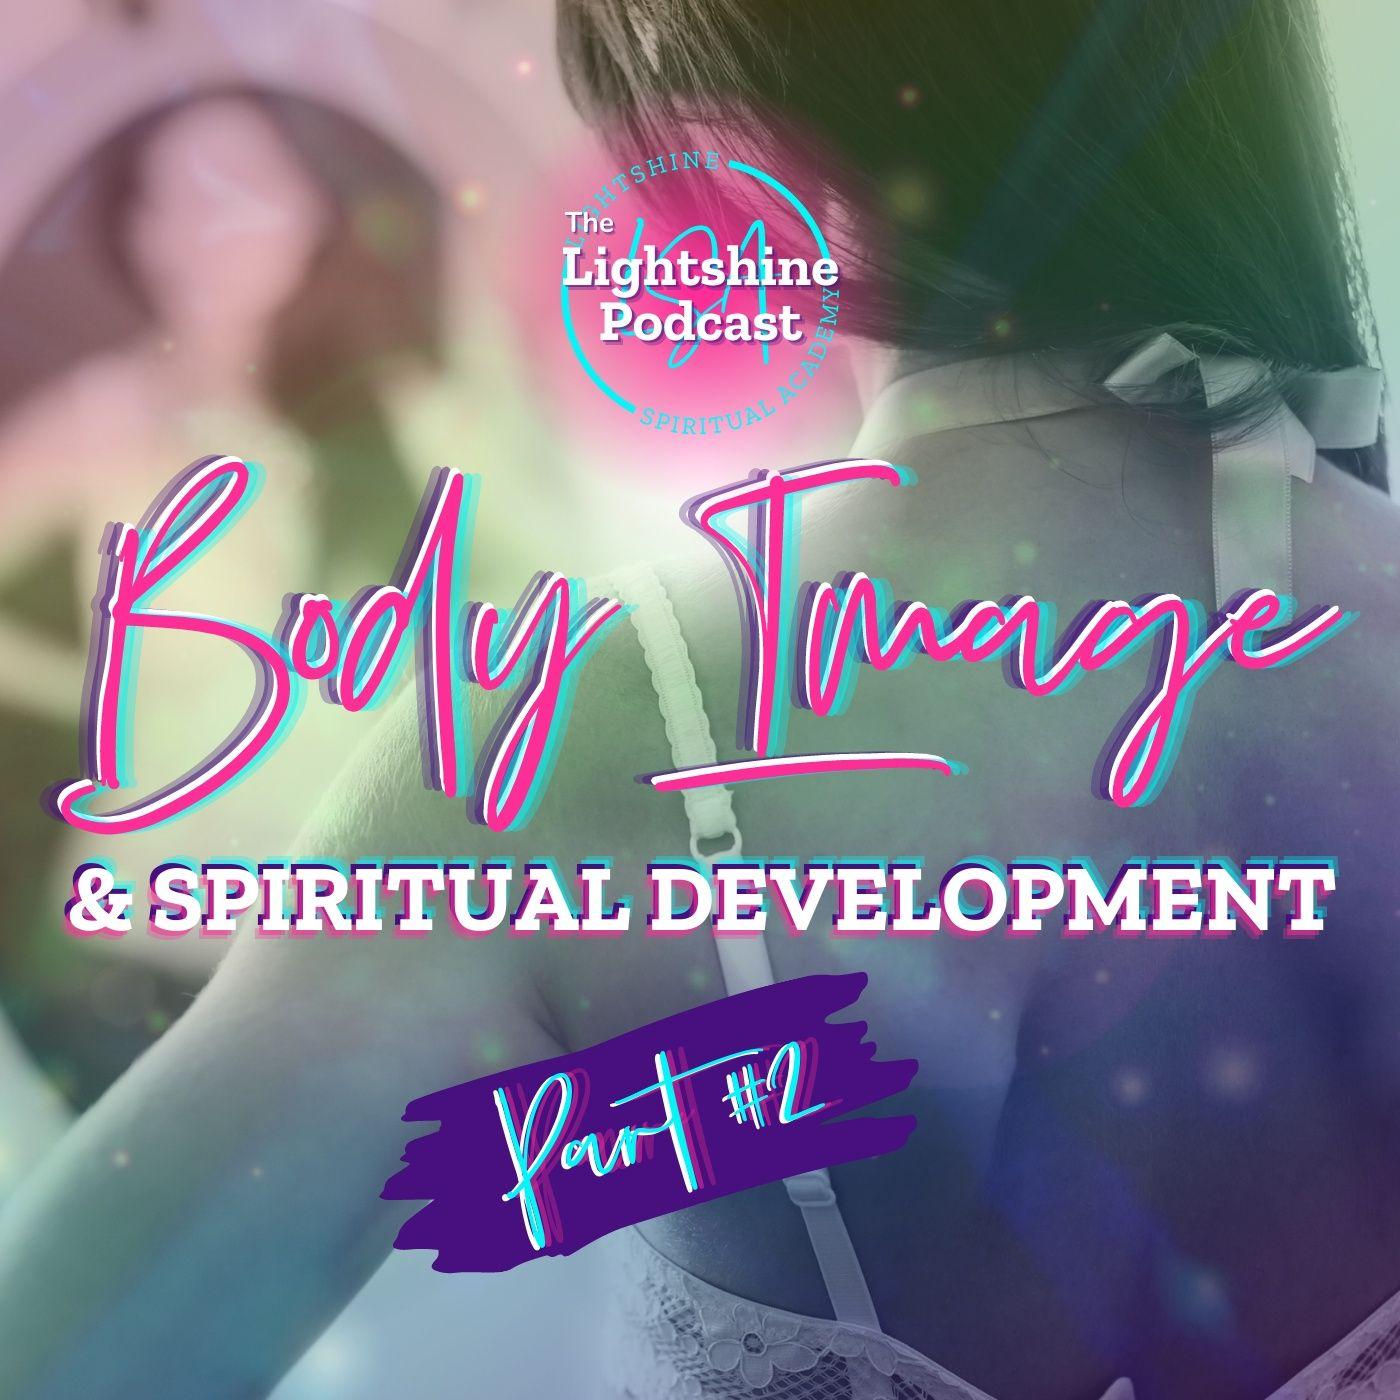 30: Part 2 - Body Image & Spiritual Development